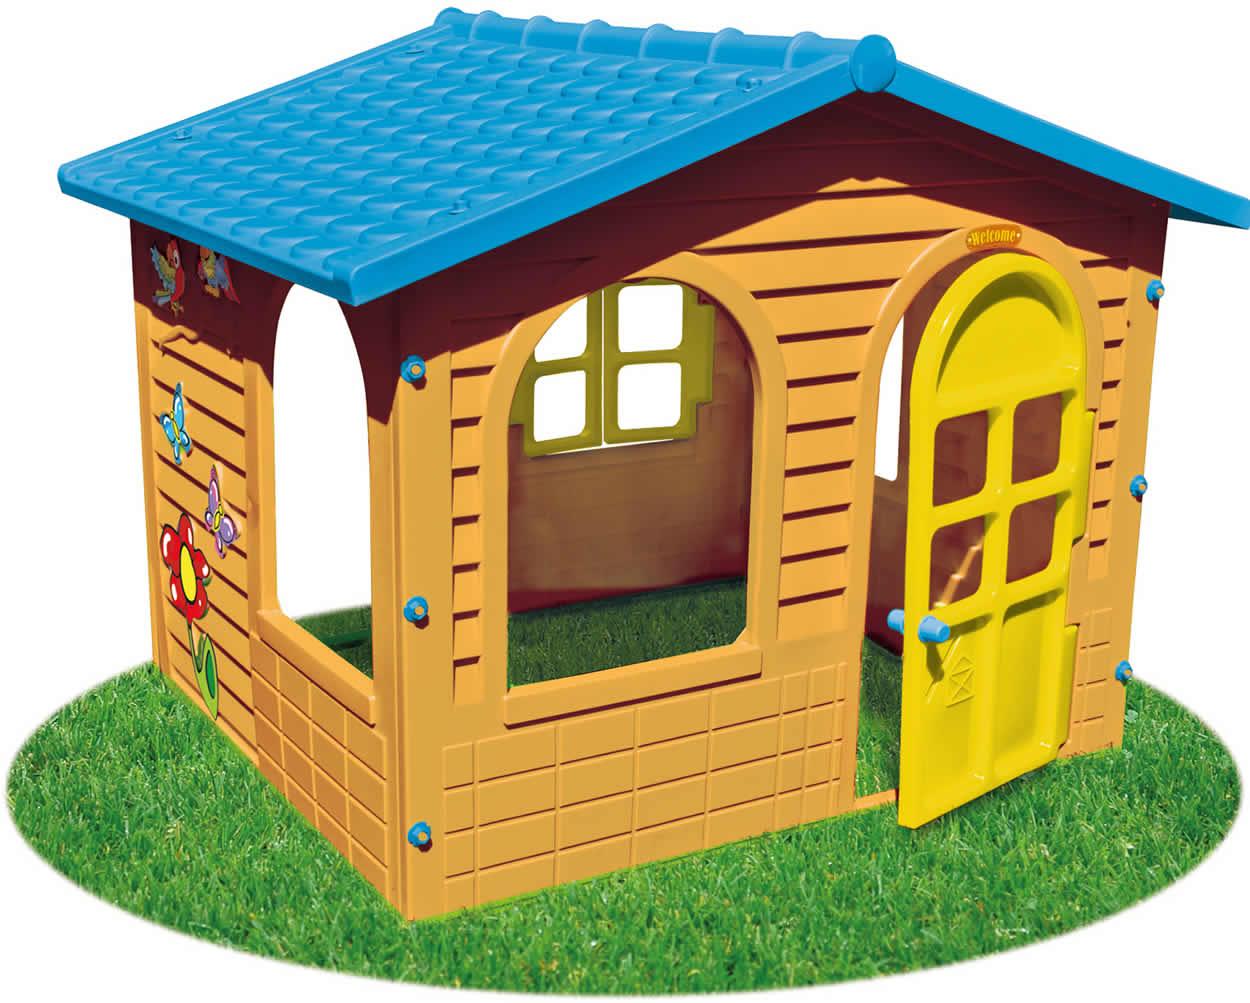 mochtoys spielhaus kinderspielhaus gartenhaus kunststoff. Black Bedroom Furniture Sets. Home Design Ideas